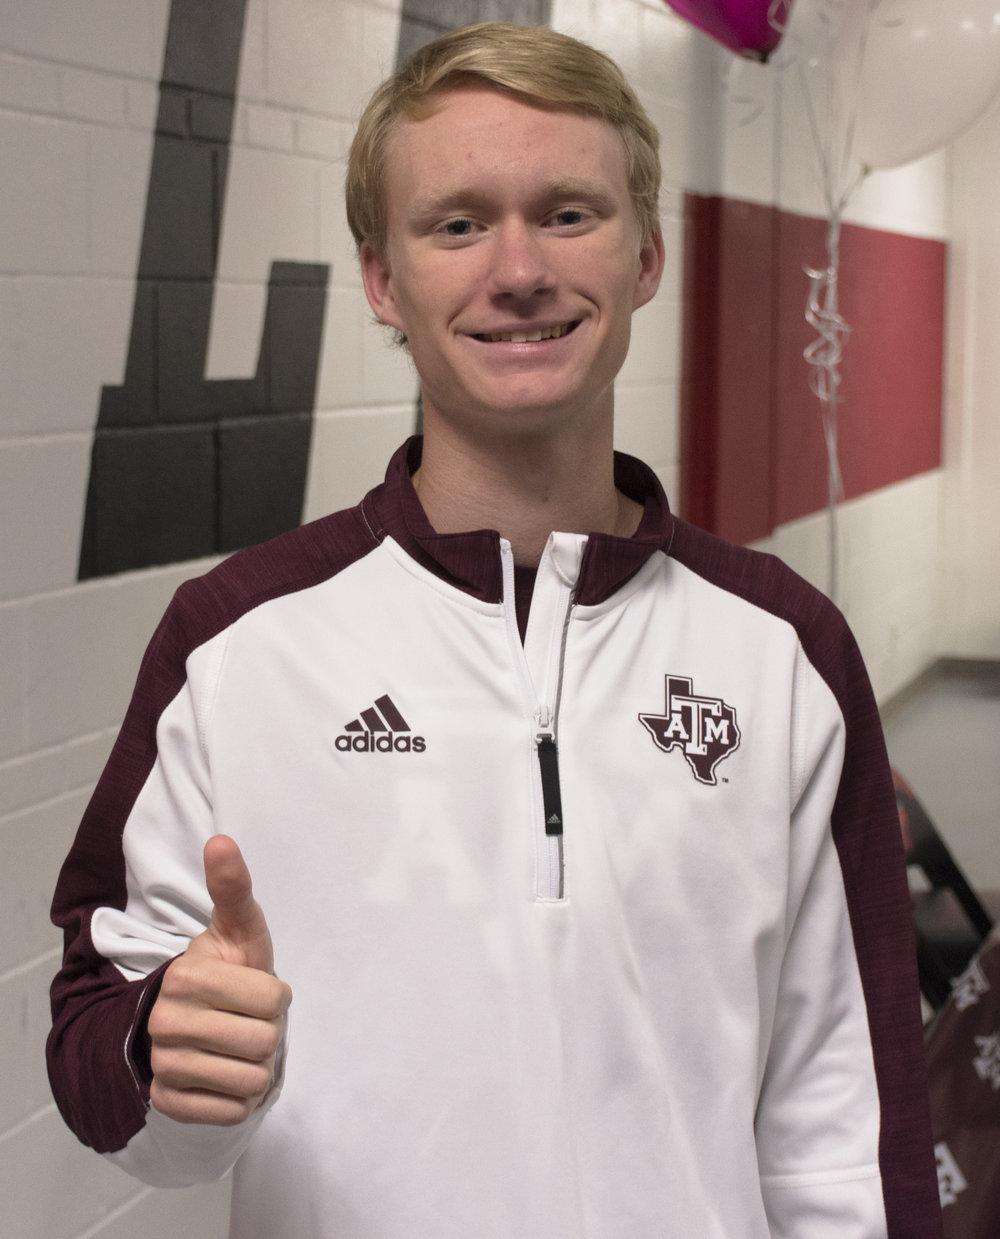 Cross Country/Track:Brady Grant - Texas A&M University